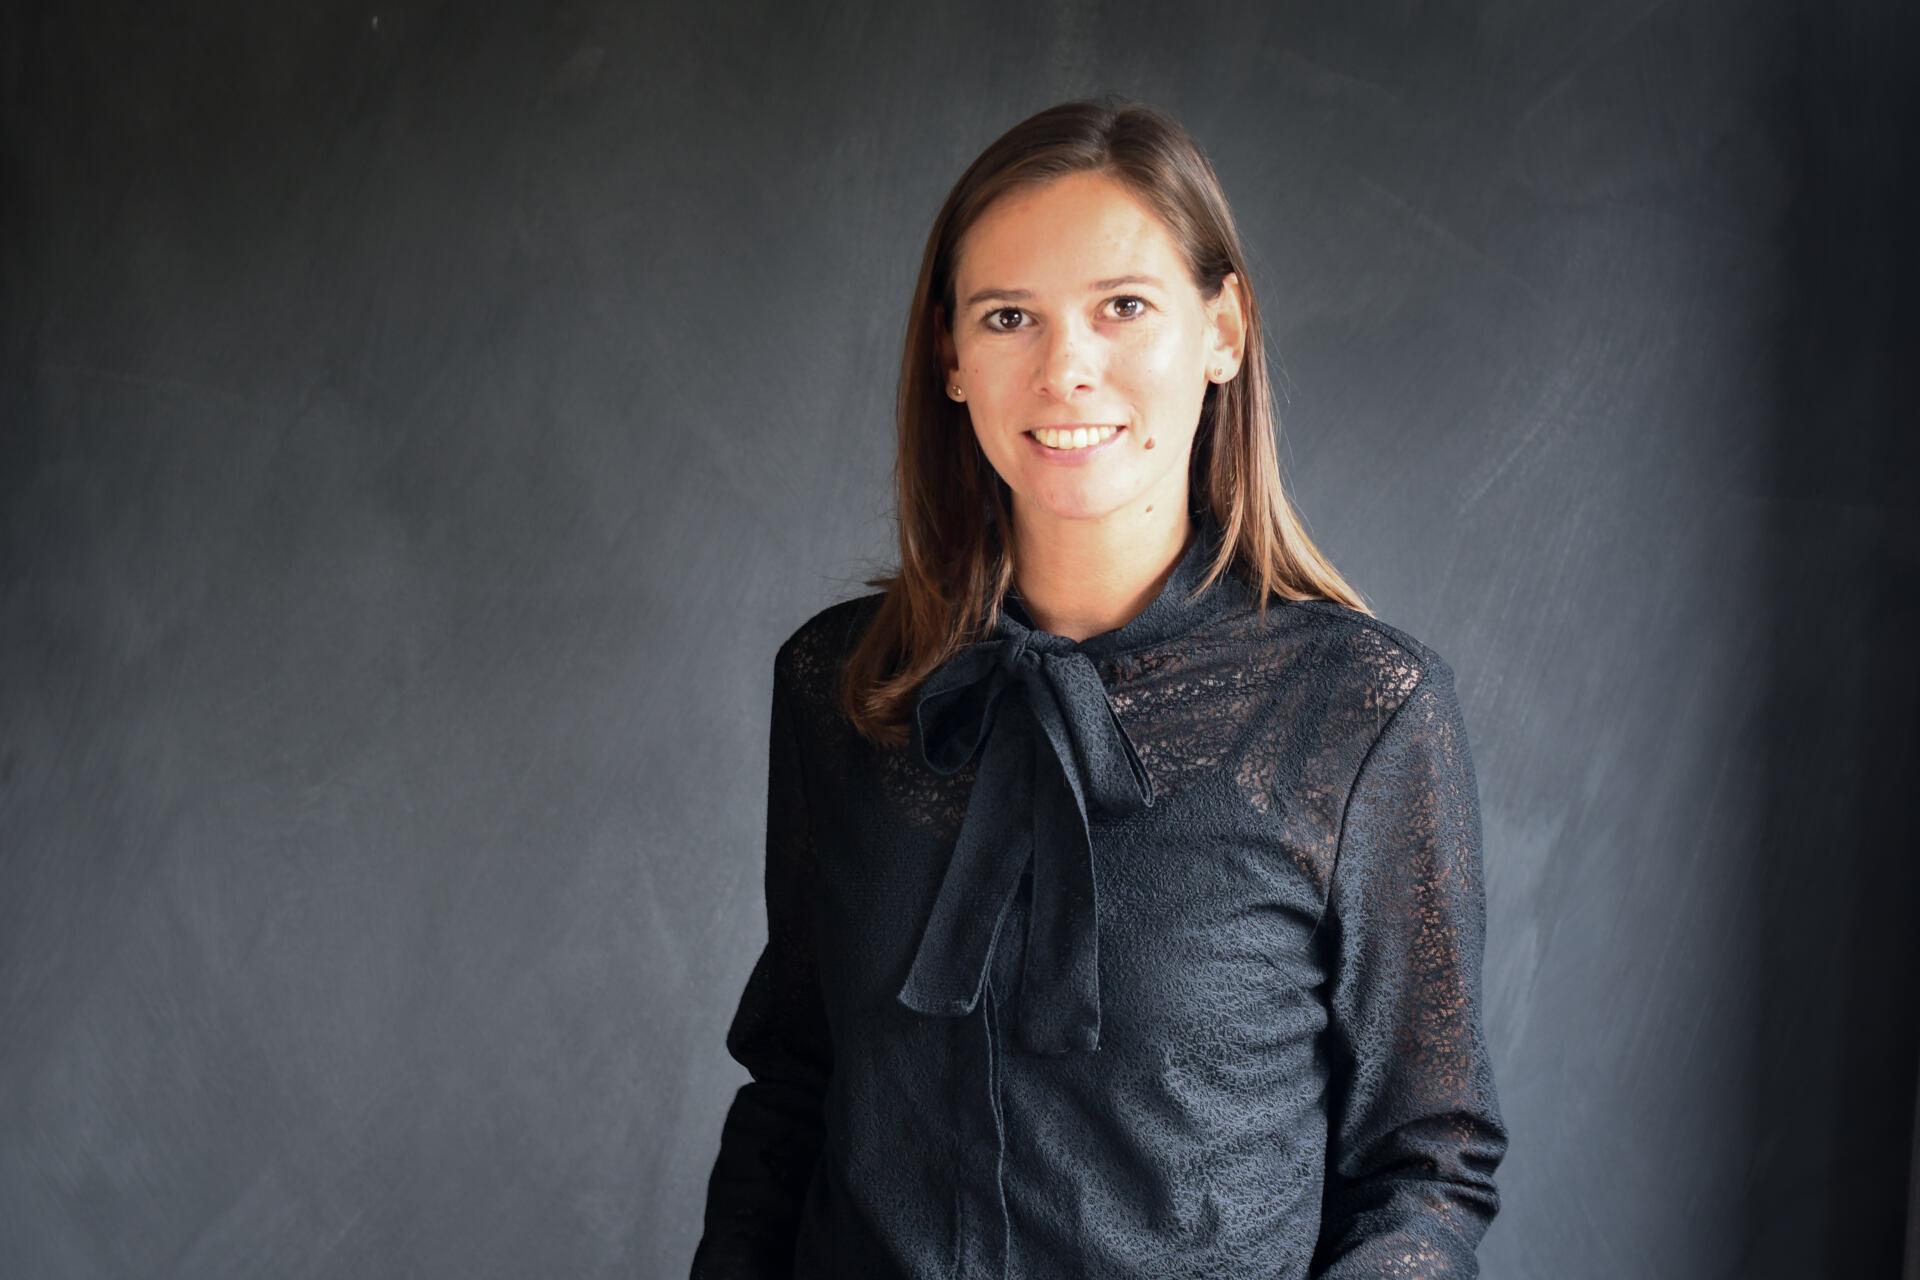 Nadine Groeneveld-Tijssens